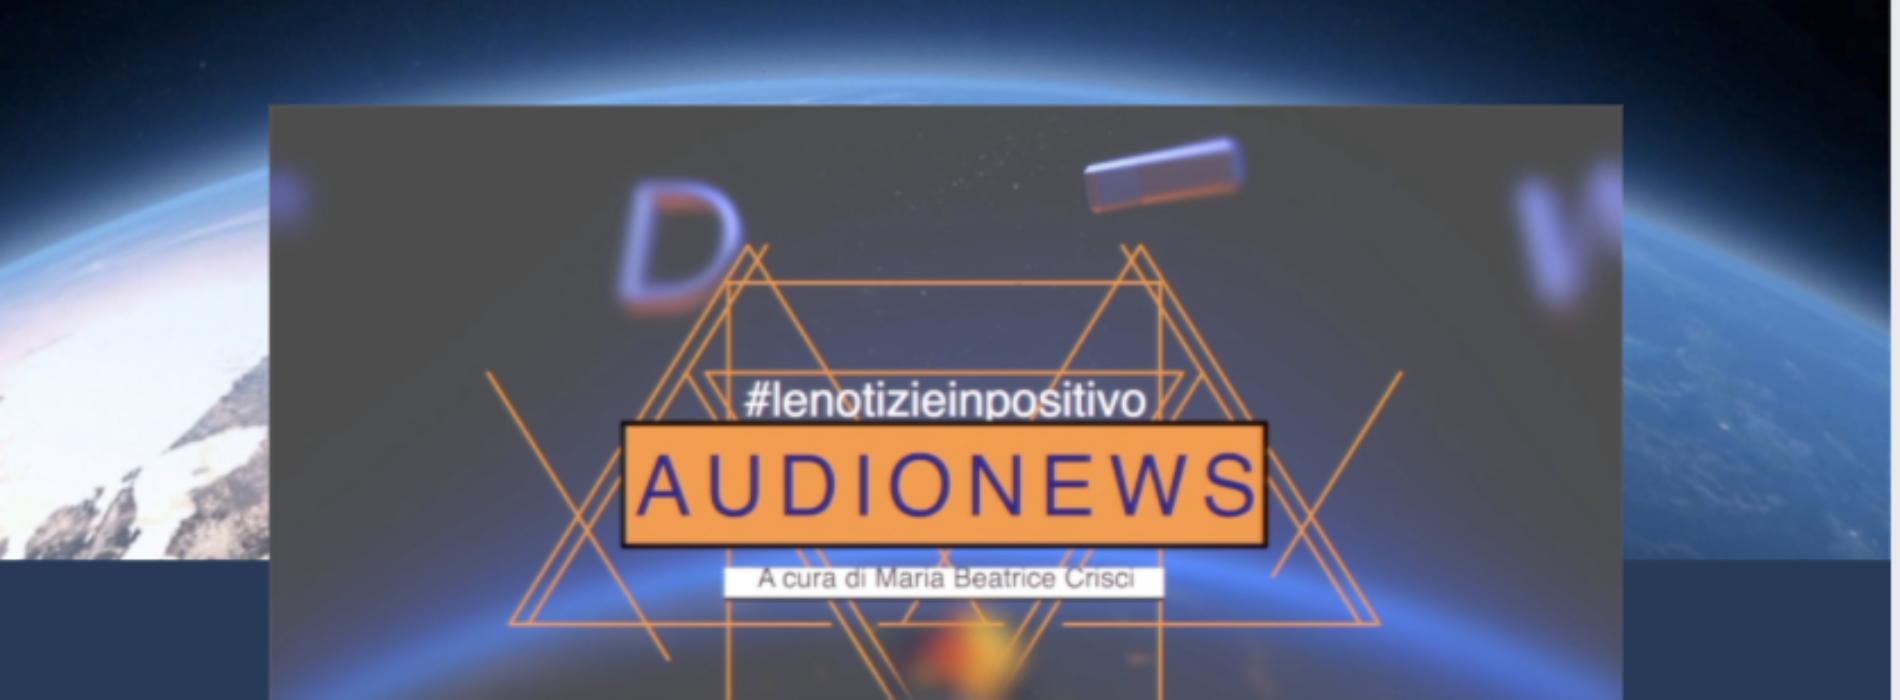 Audionews di Ondawebtv. 7 gennaio